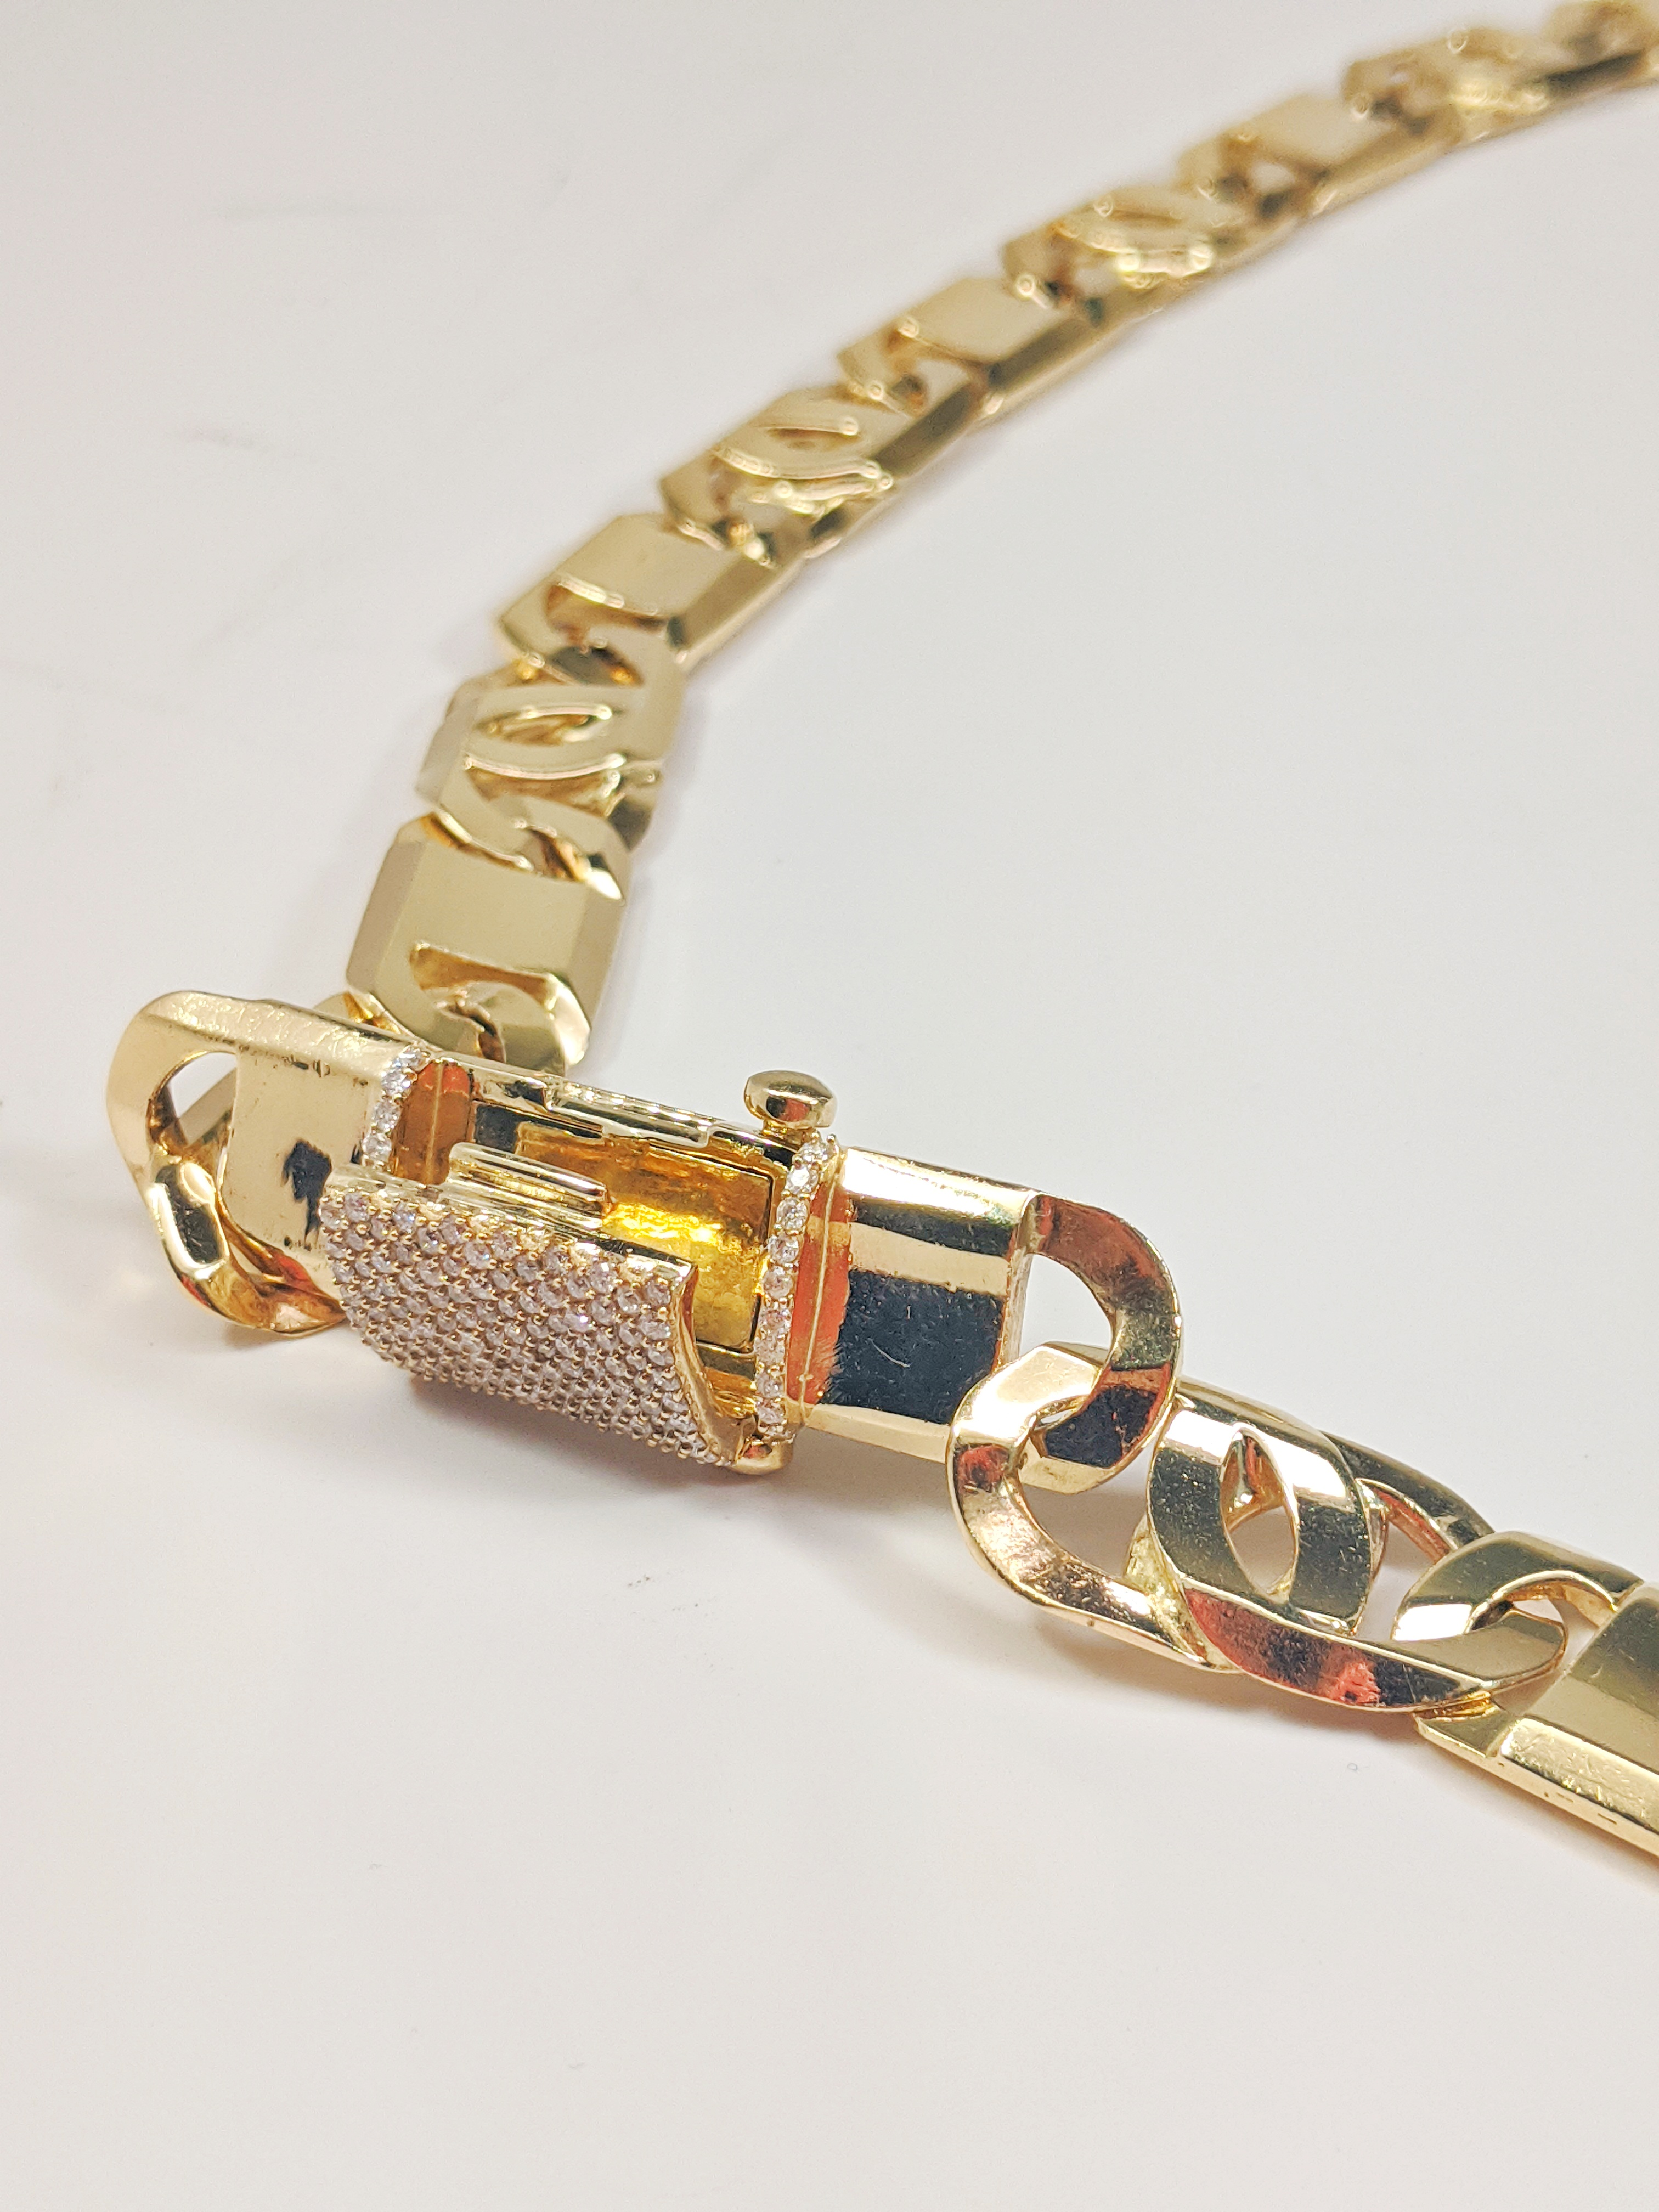 14KT Yellow Gold Solid Heavy Fancy Tiger Eye Link Chain, Hand Made Italian Chain 12MM wide, VVS Pave Diamond Lock, Cuban Box Lock, Side View Open Lock